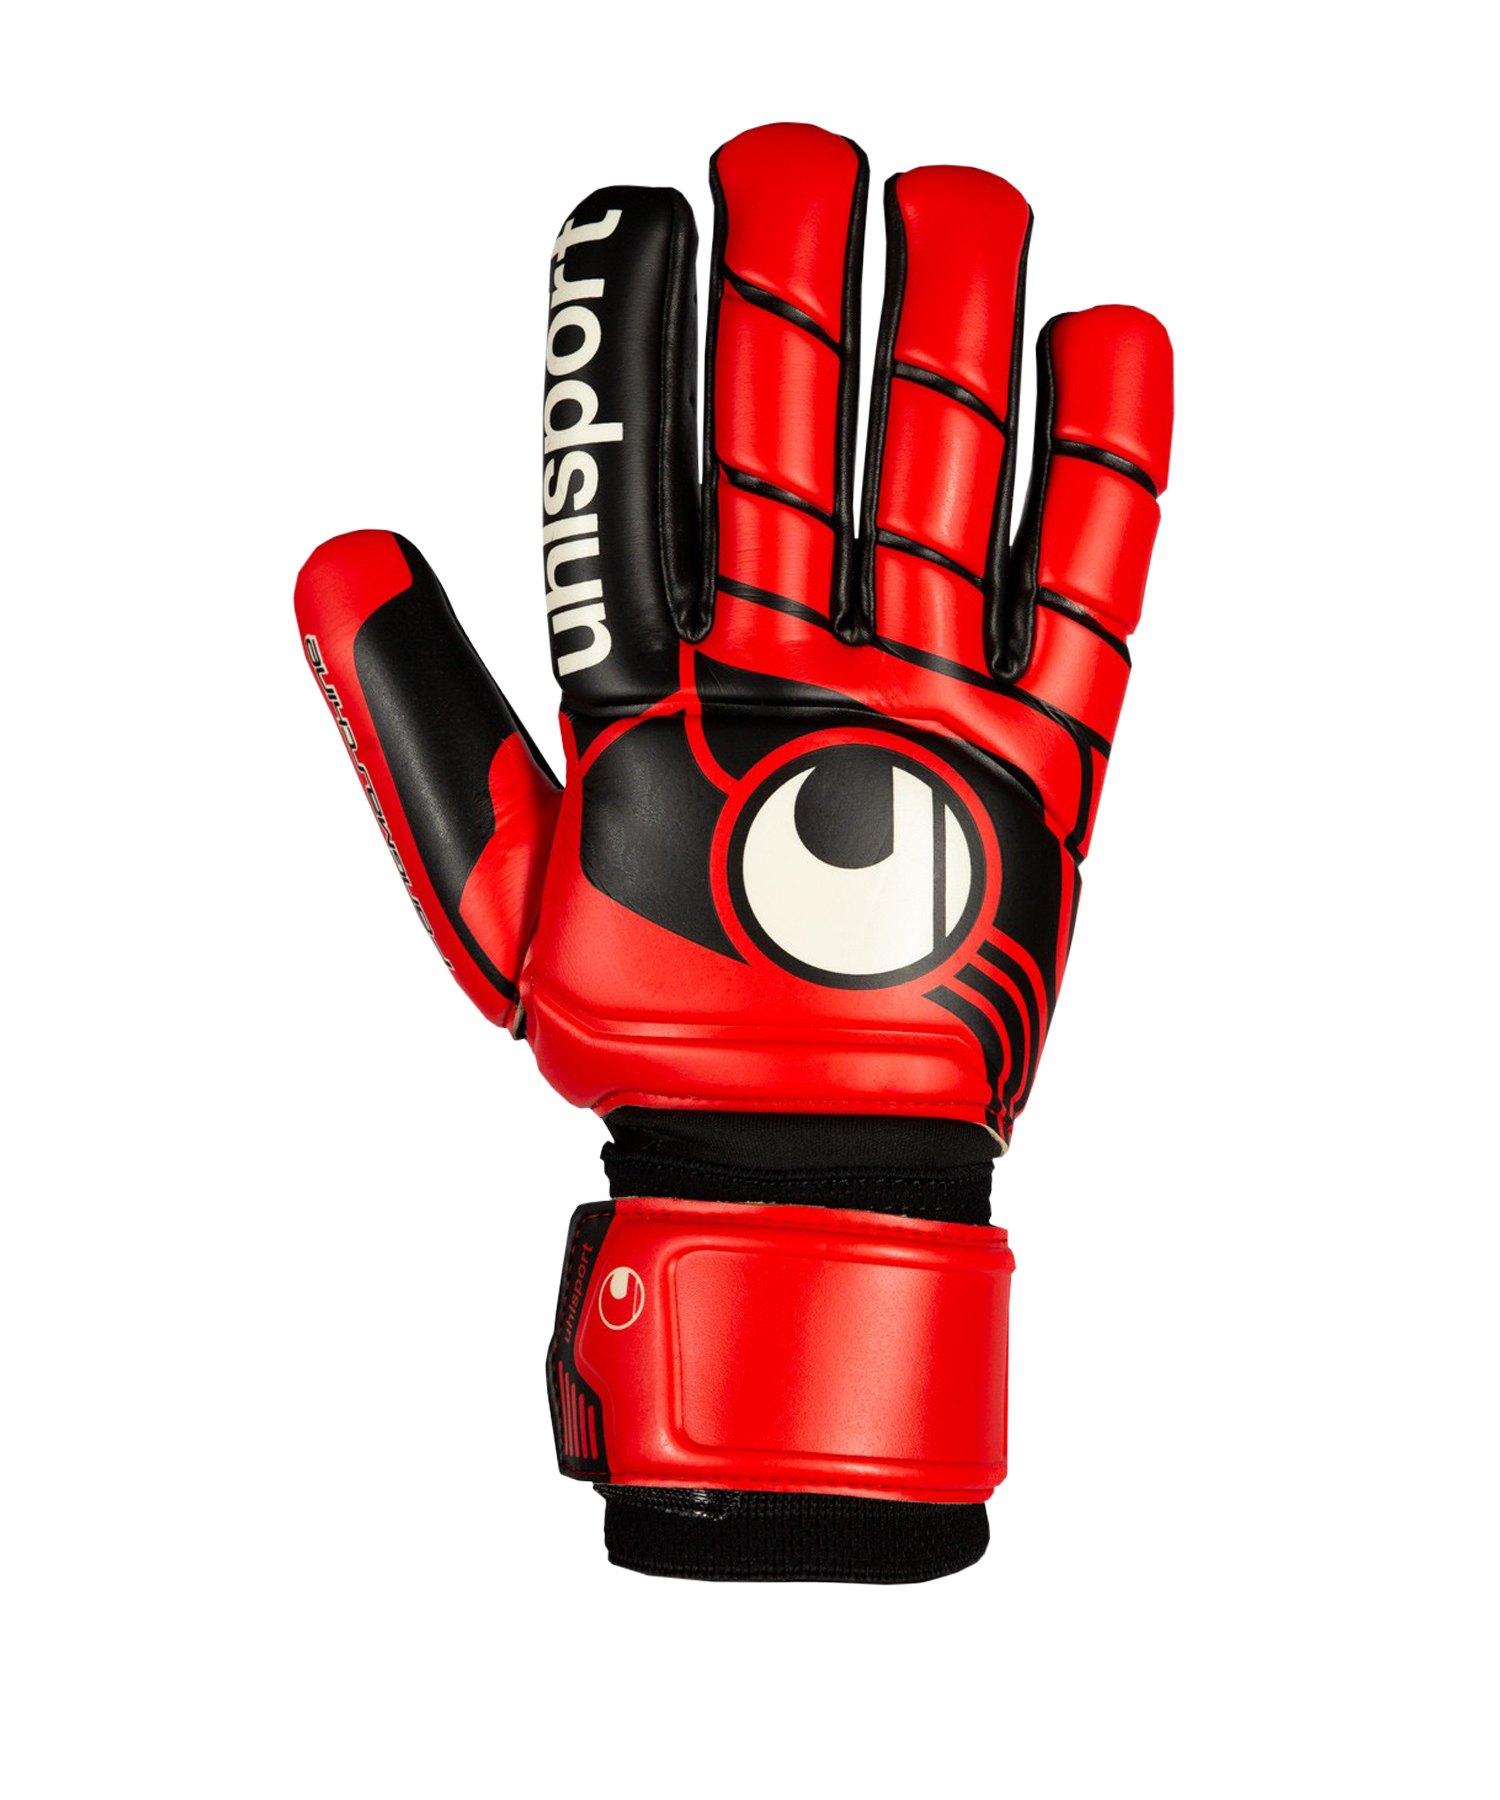 Uhlsport Retro Fangmaschine SG HN TW-Handschuh F01 - rot